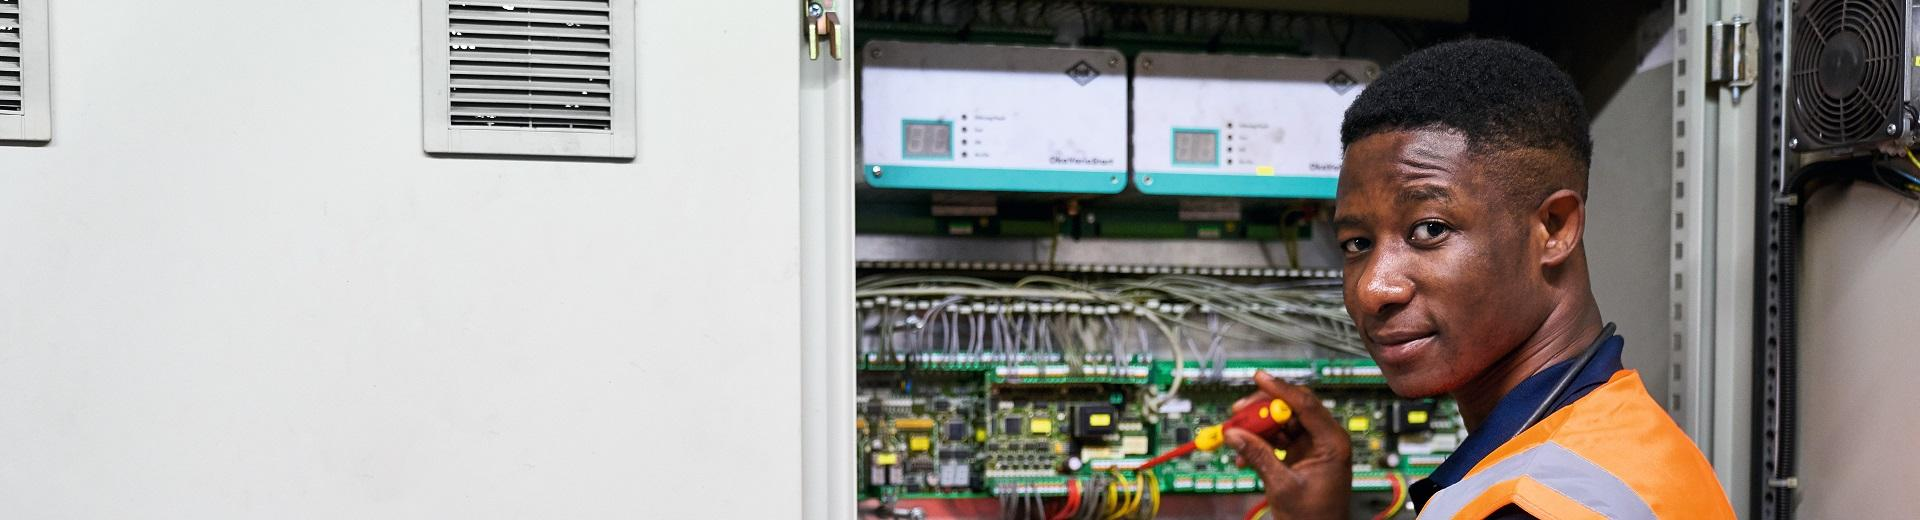 W065_Azubi_Chance_plus_Elektroniker_für_Betriebstechnik